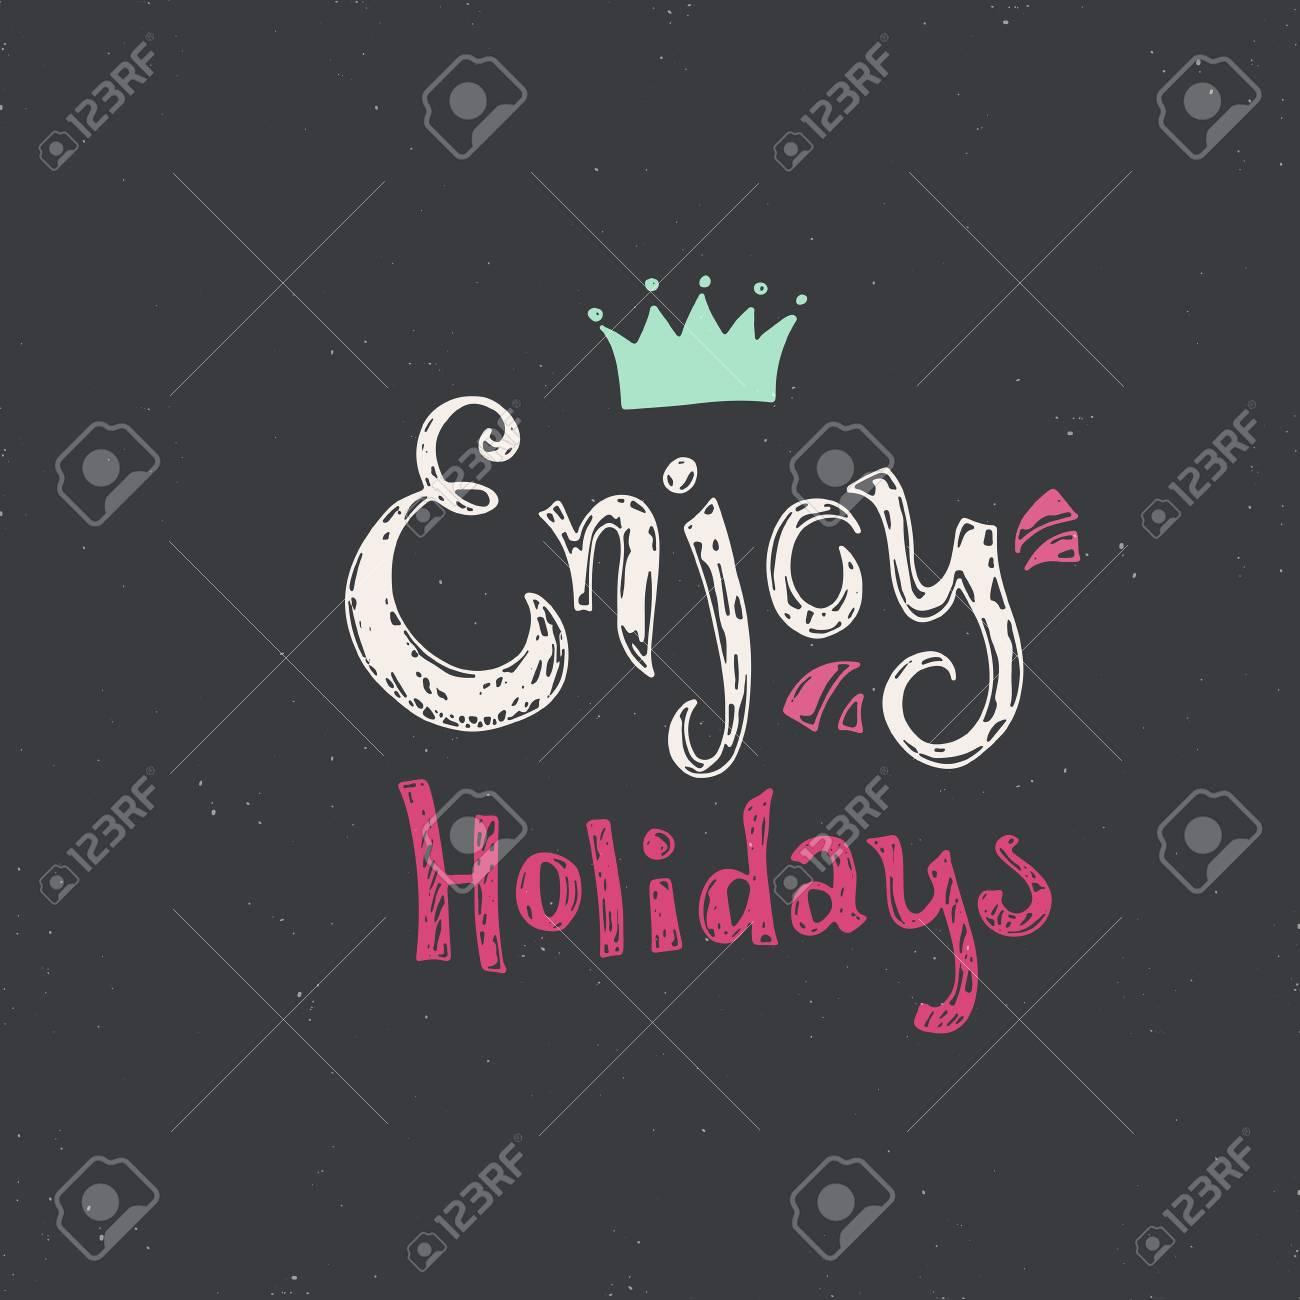 Enjoy Holidays Merry Christmas Card Or Holiday Greetings Design